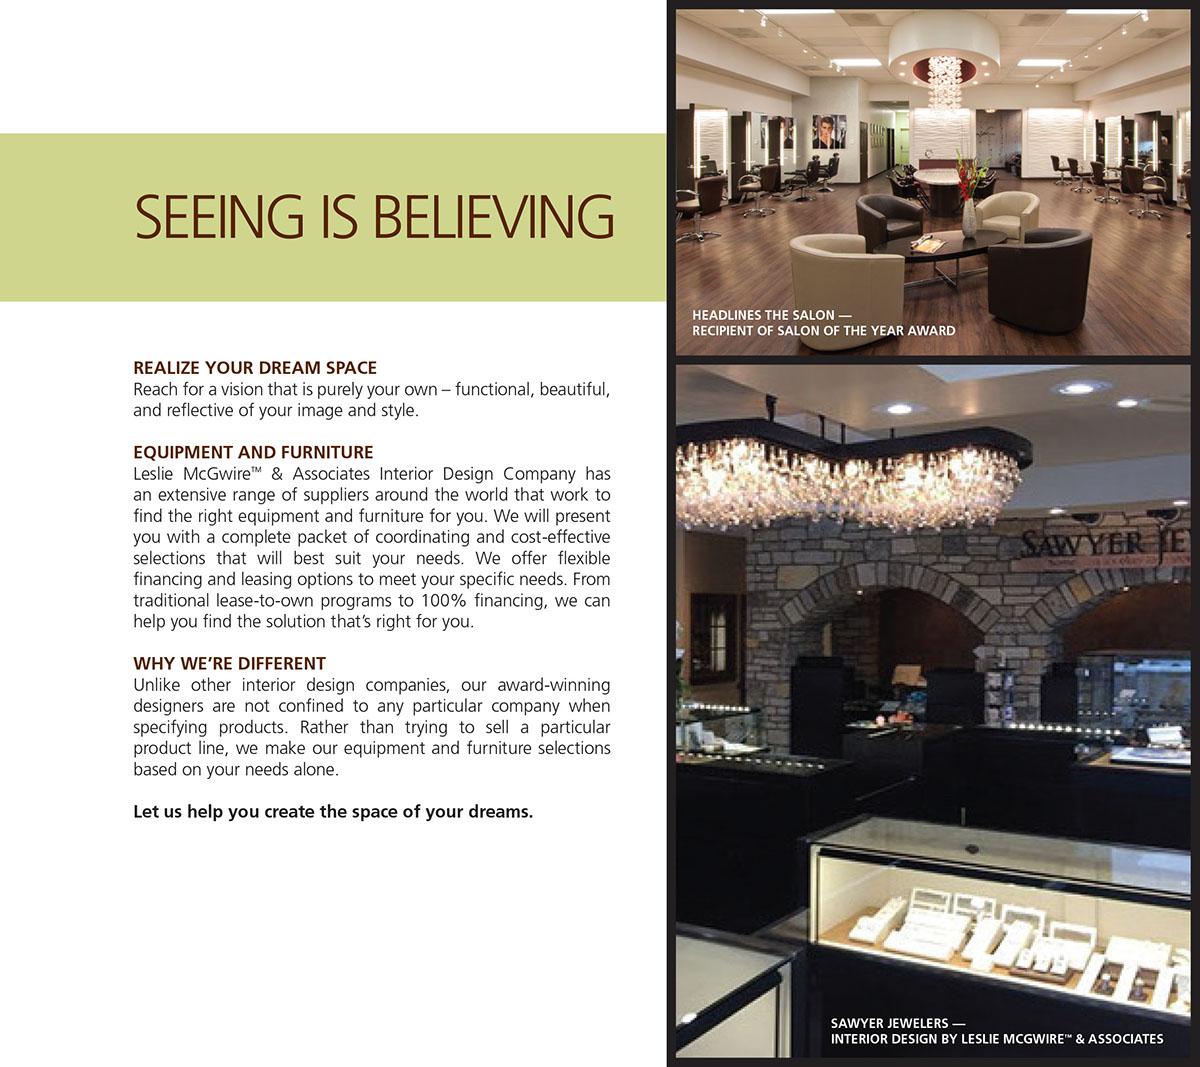 Interior Design Leslie McGwireTM Associate Company On Behance